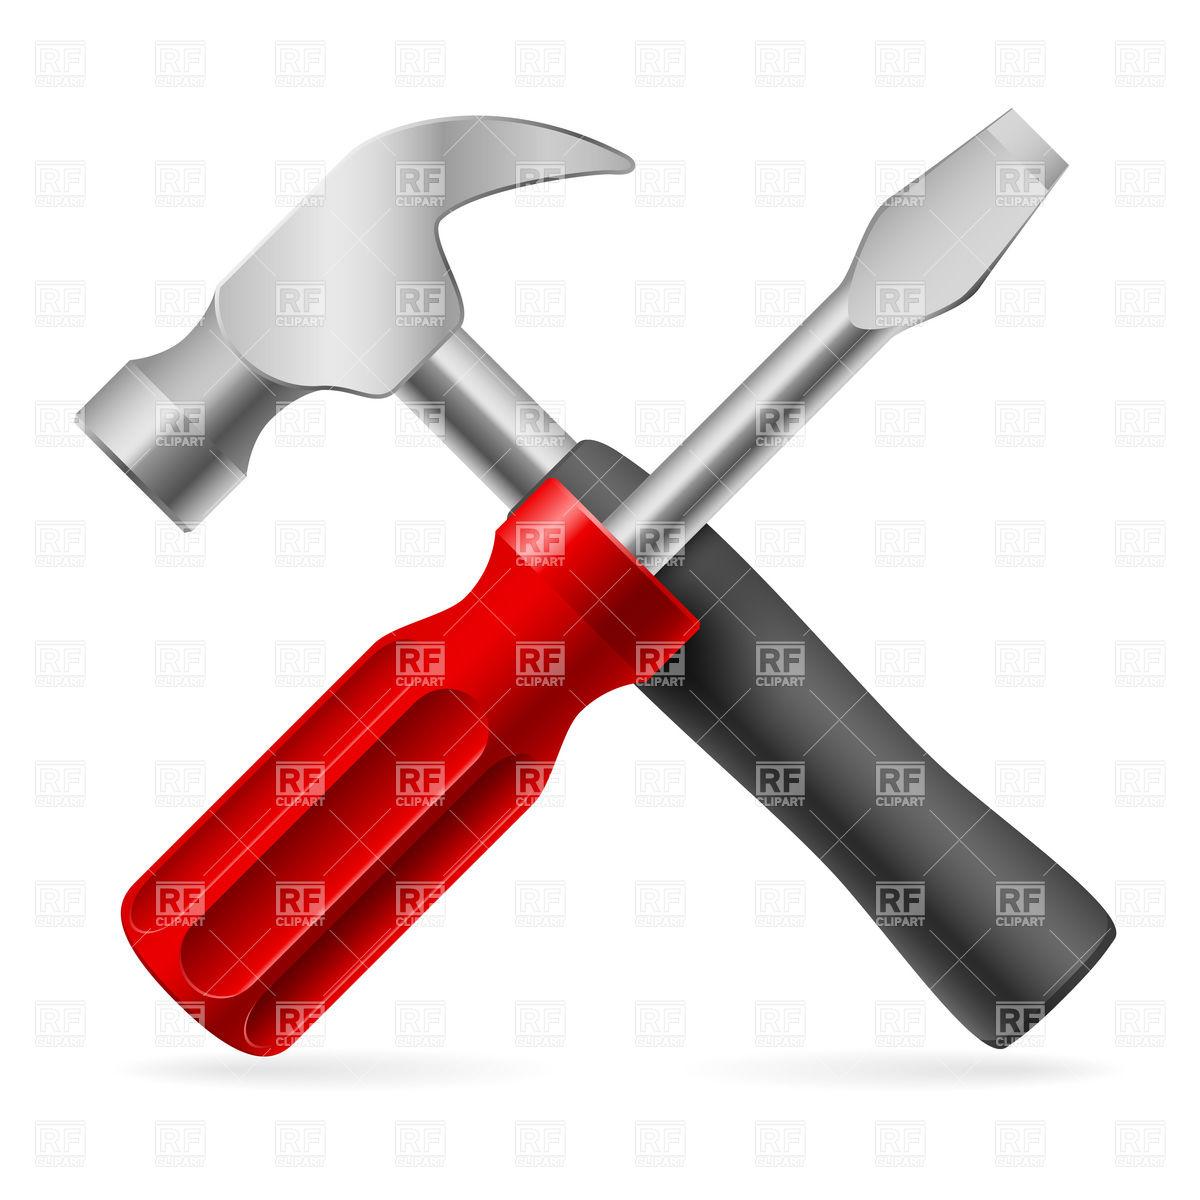 Red clipart screwdriver #10